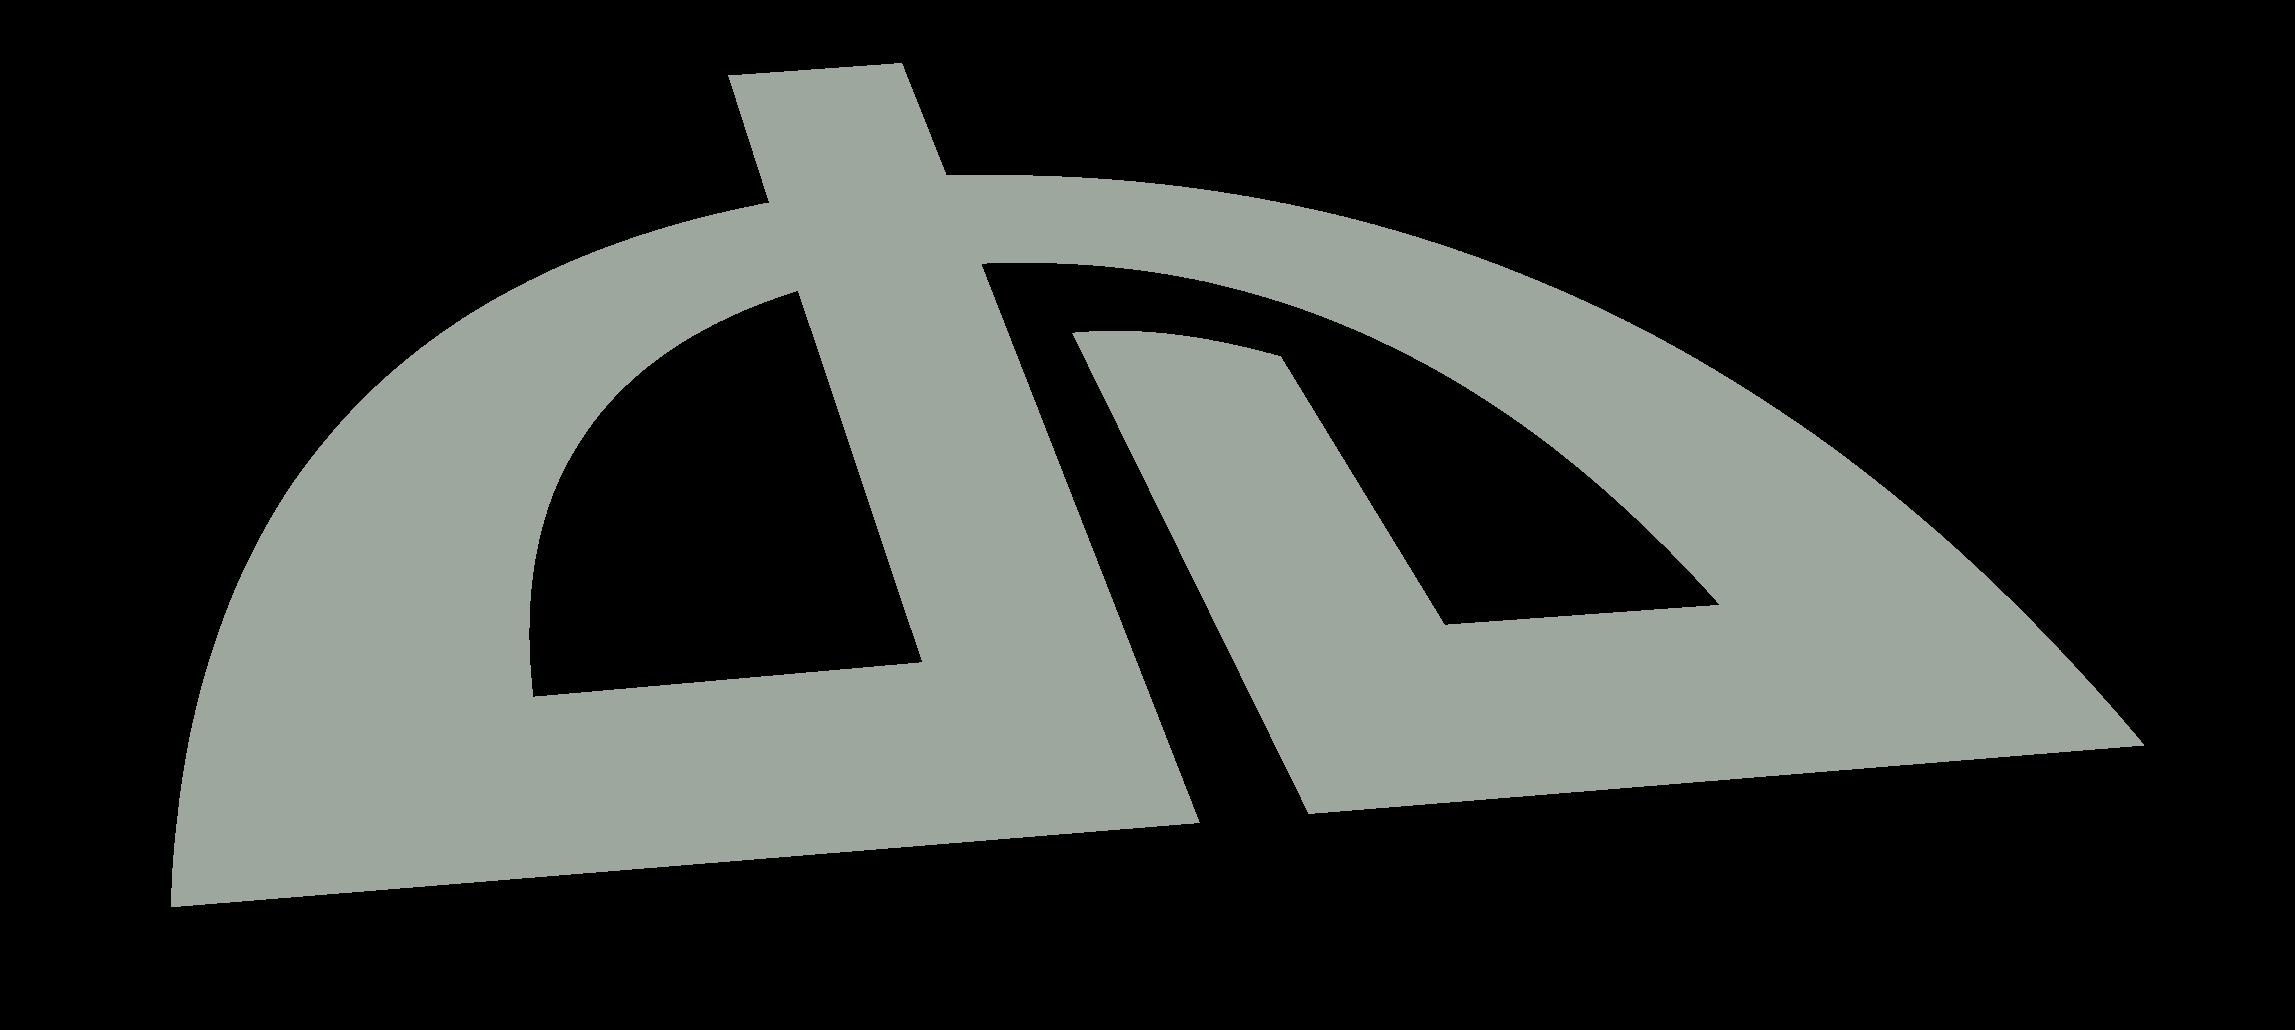 Deviantart Logo PNG - 10644